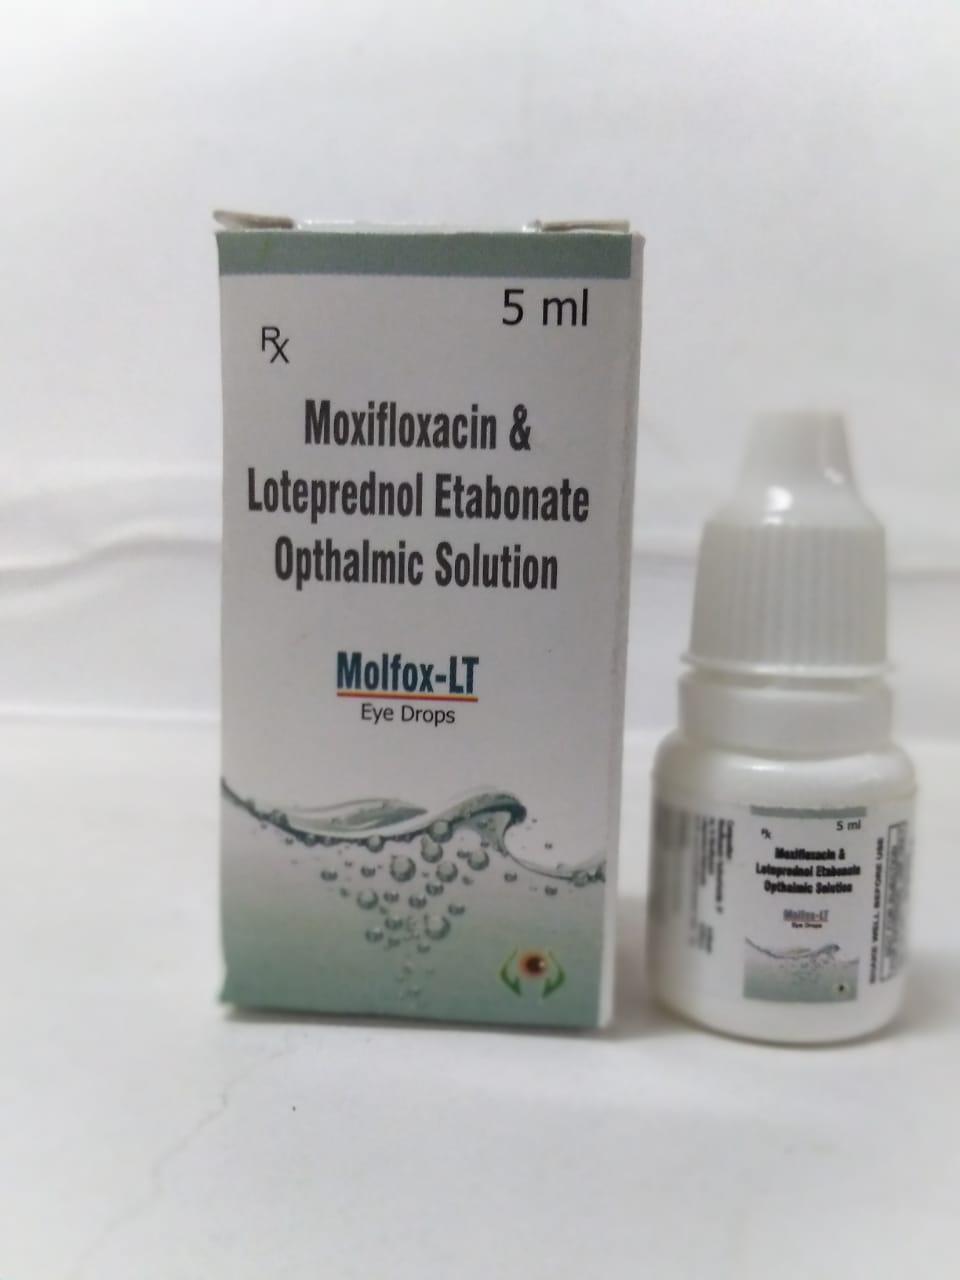 MEXIFLOXACIN